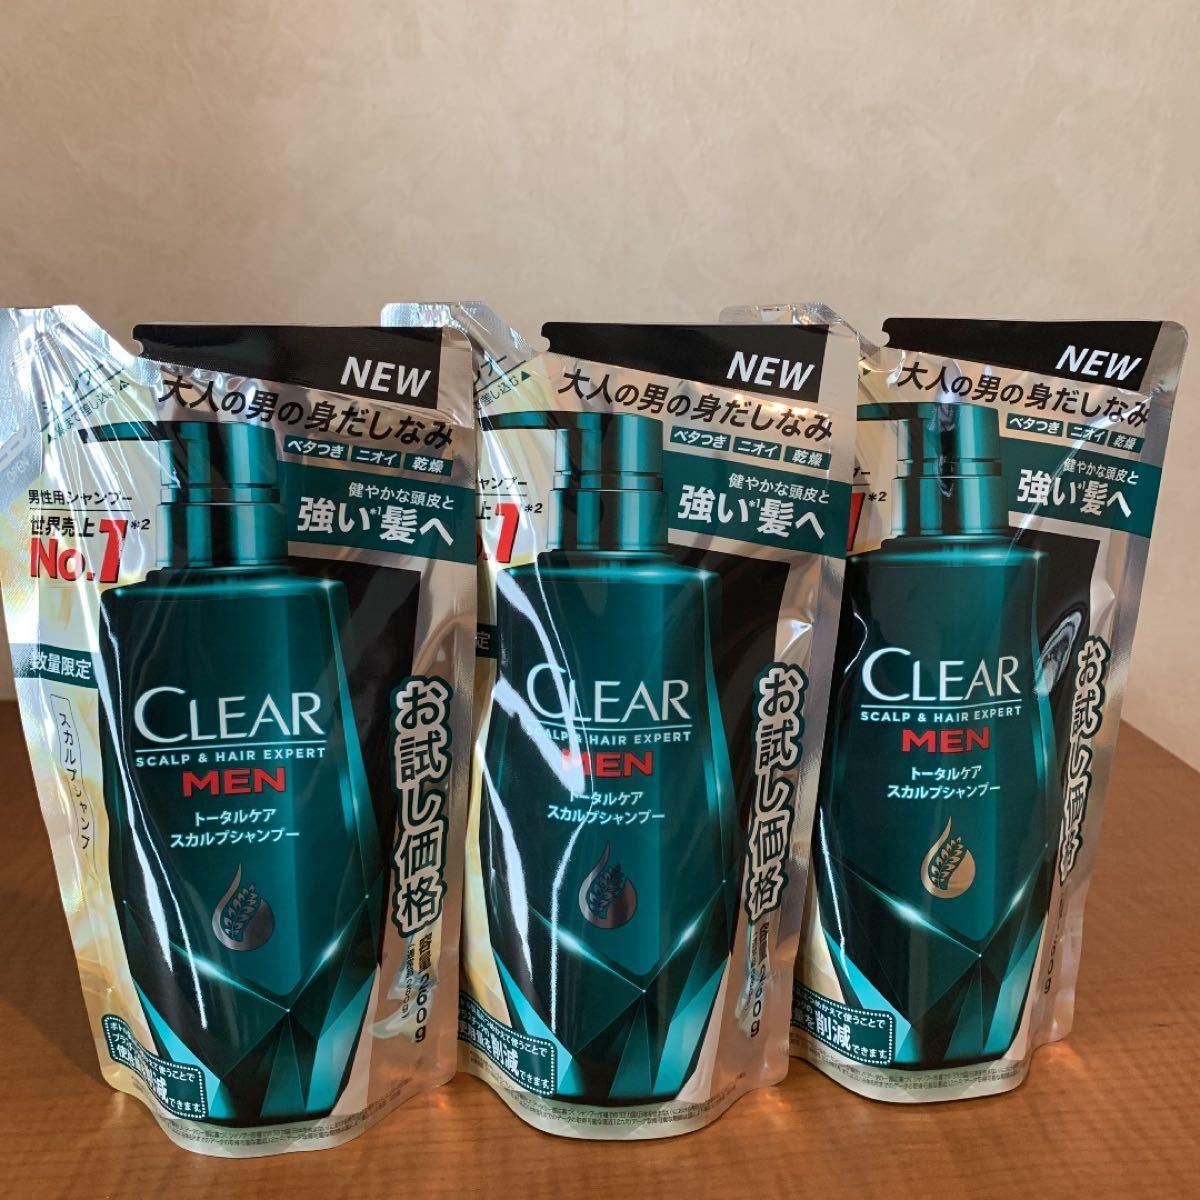 CLEAR ☆MENスカルプシャンプー3個【お試し価格】